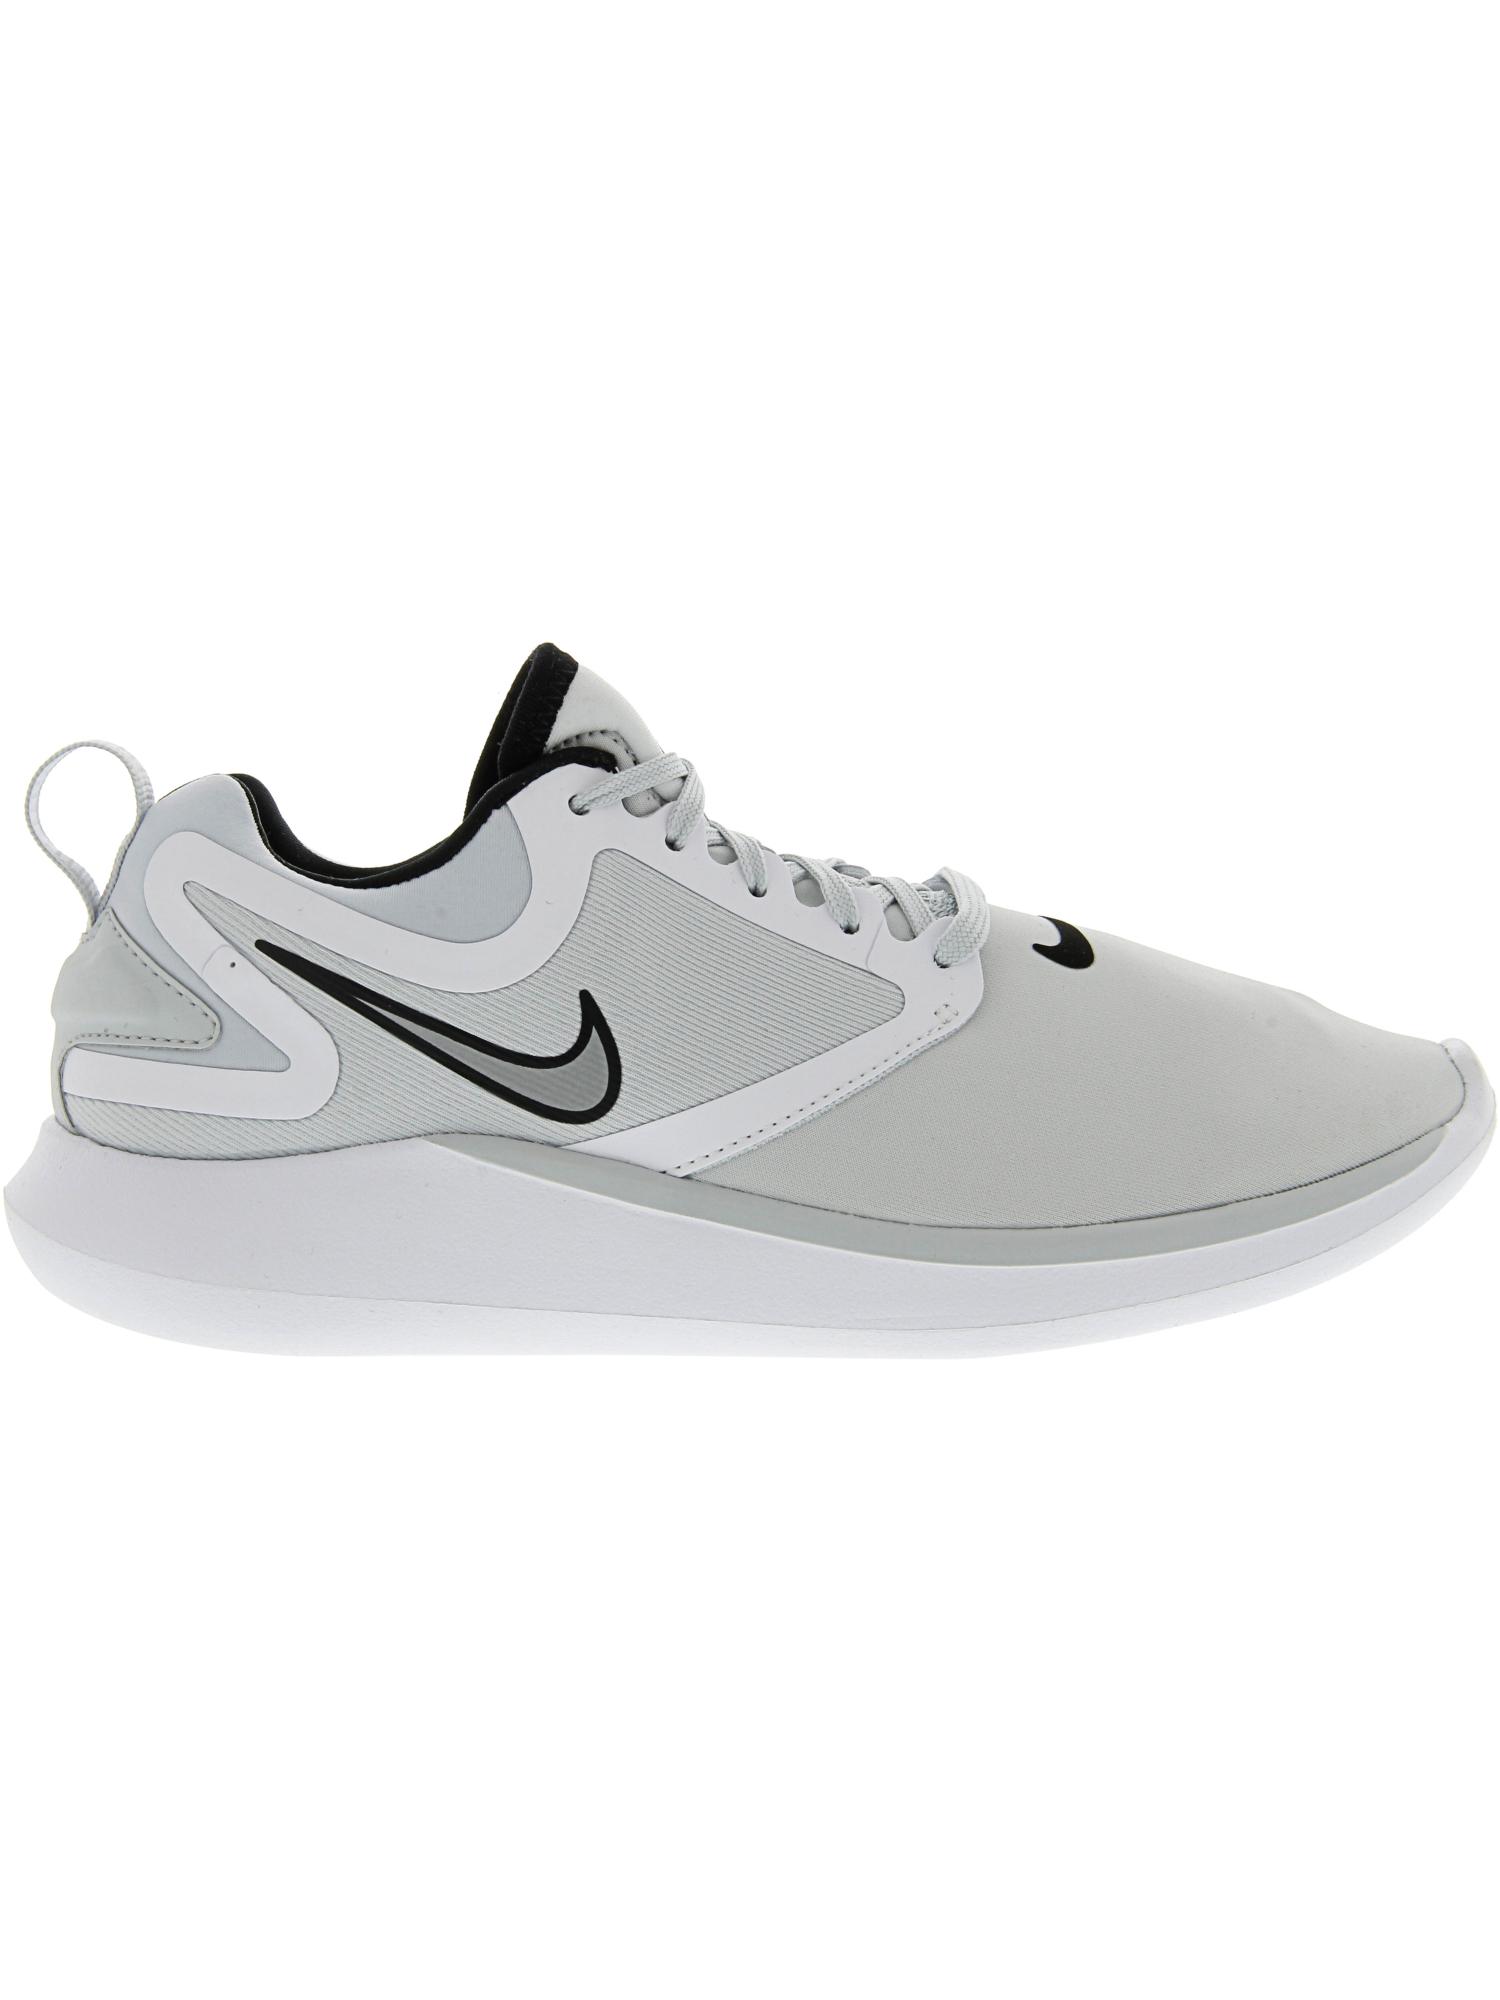 375b7cf94a1 Nike Women s Lunarsolo El Ankle-High Fabric Running Shoe